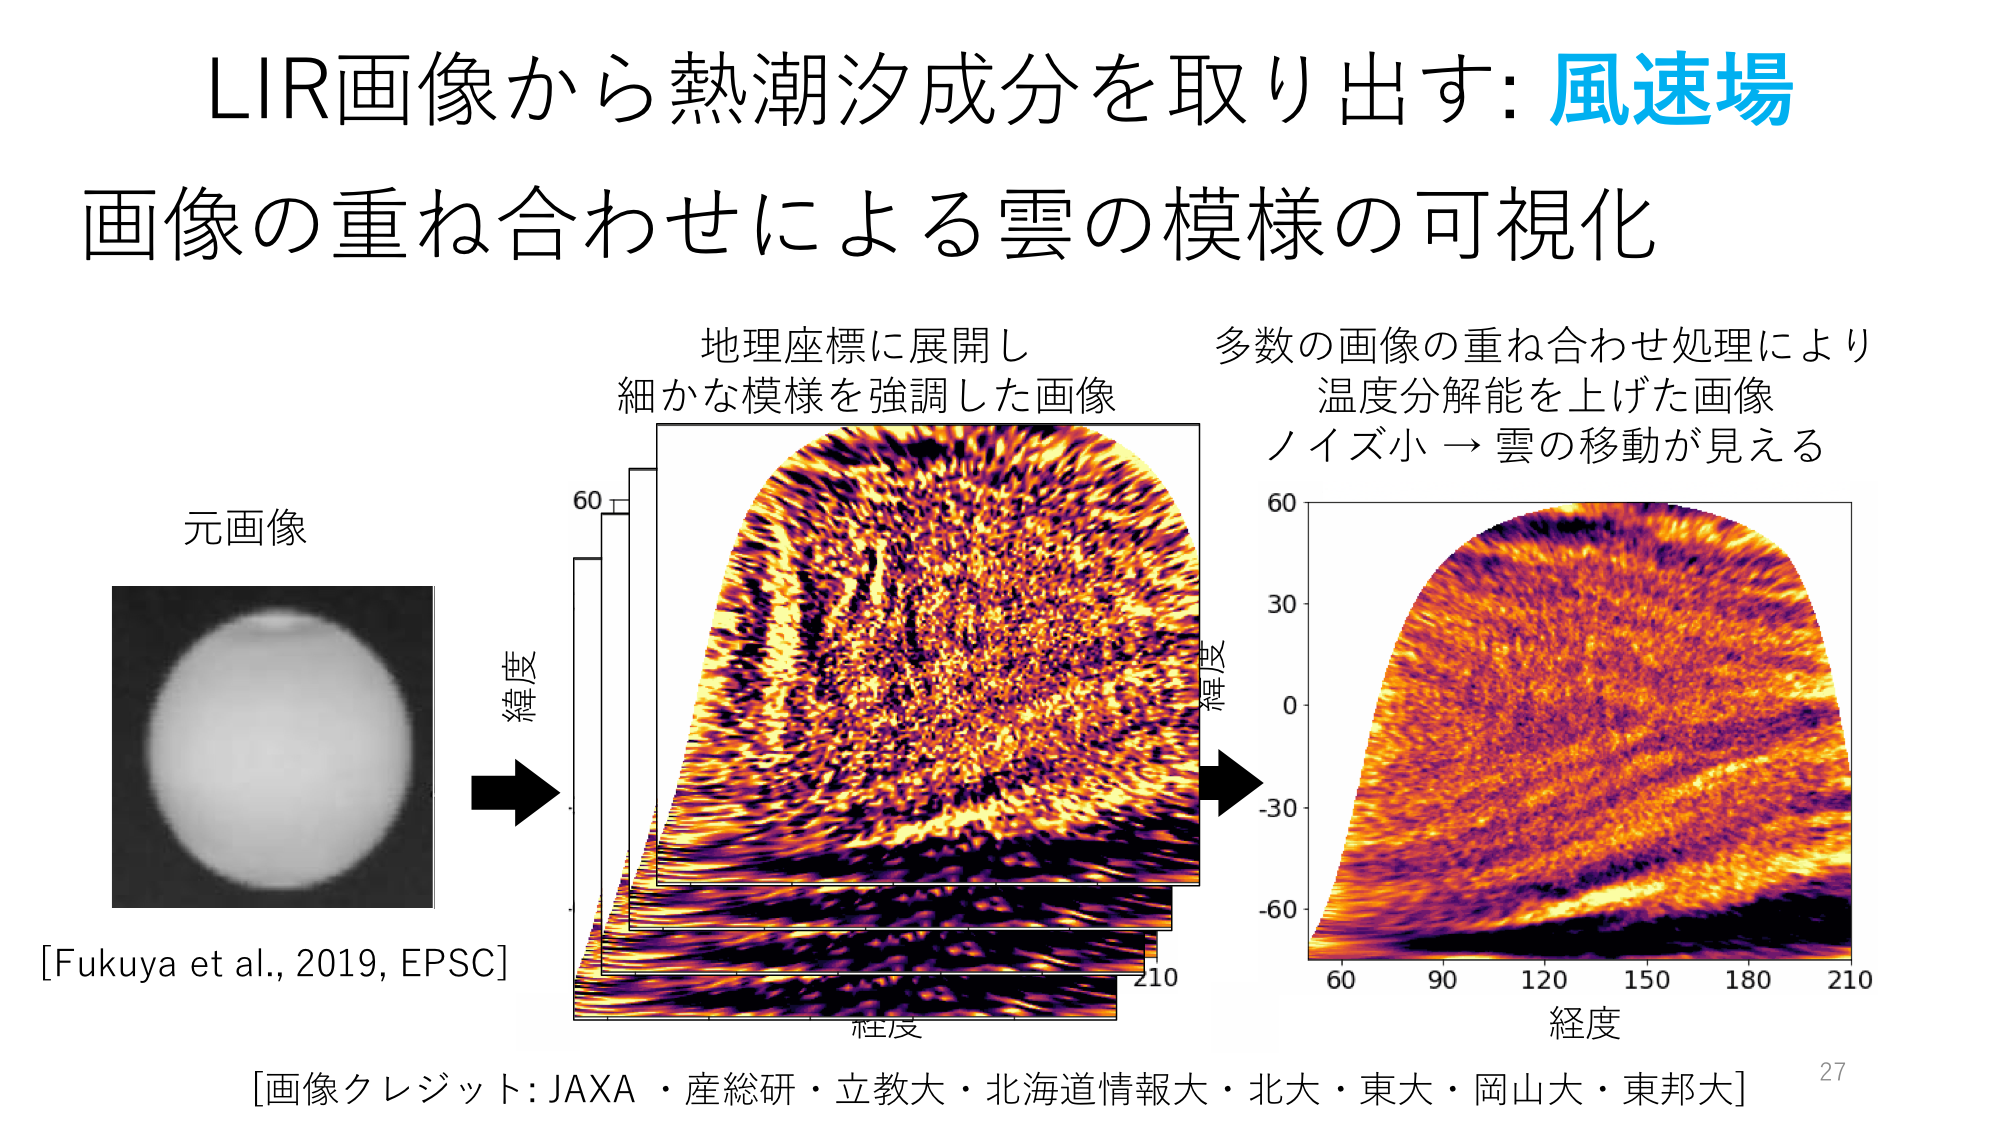 f:id:Imamura:20191119205627p:plain